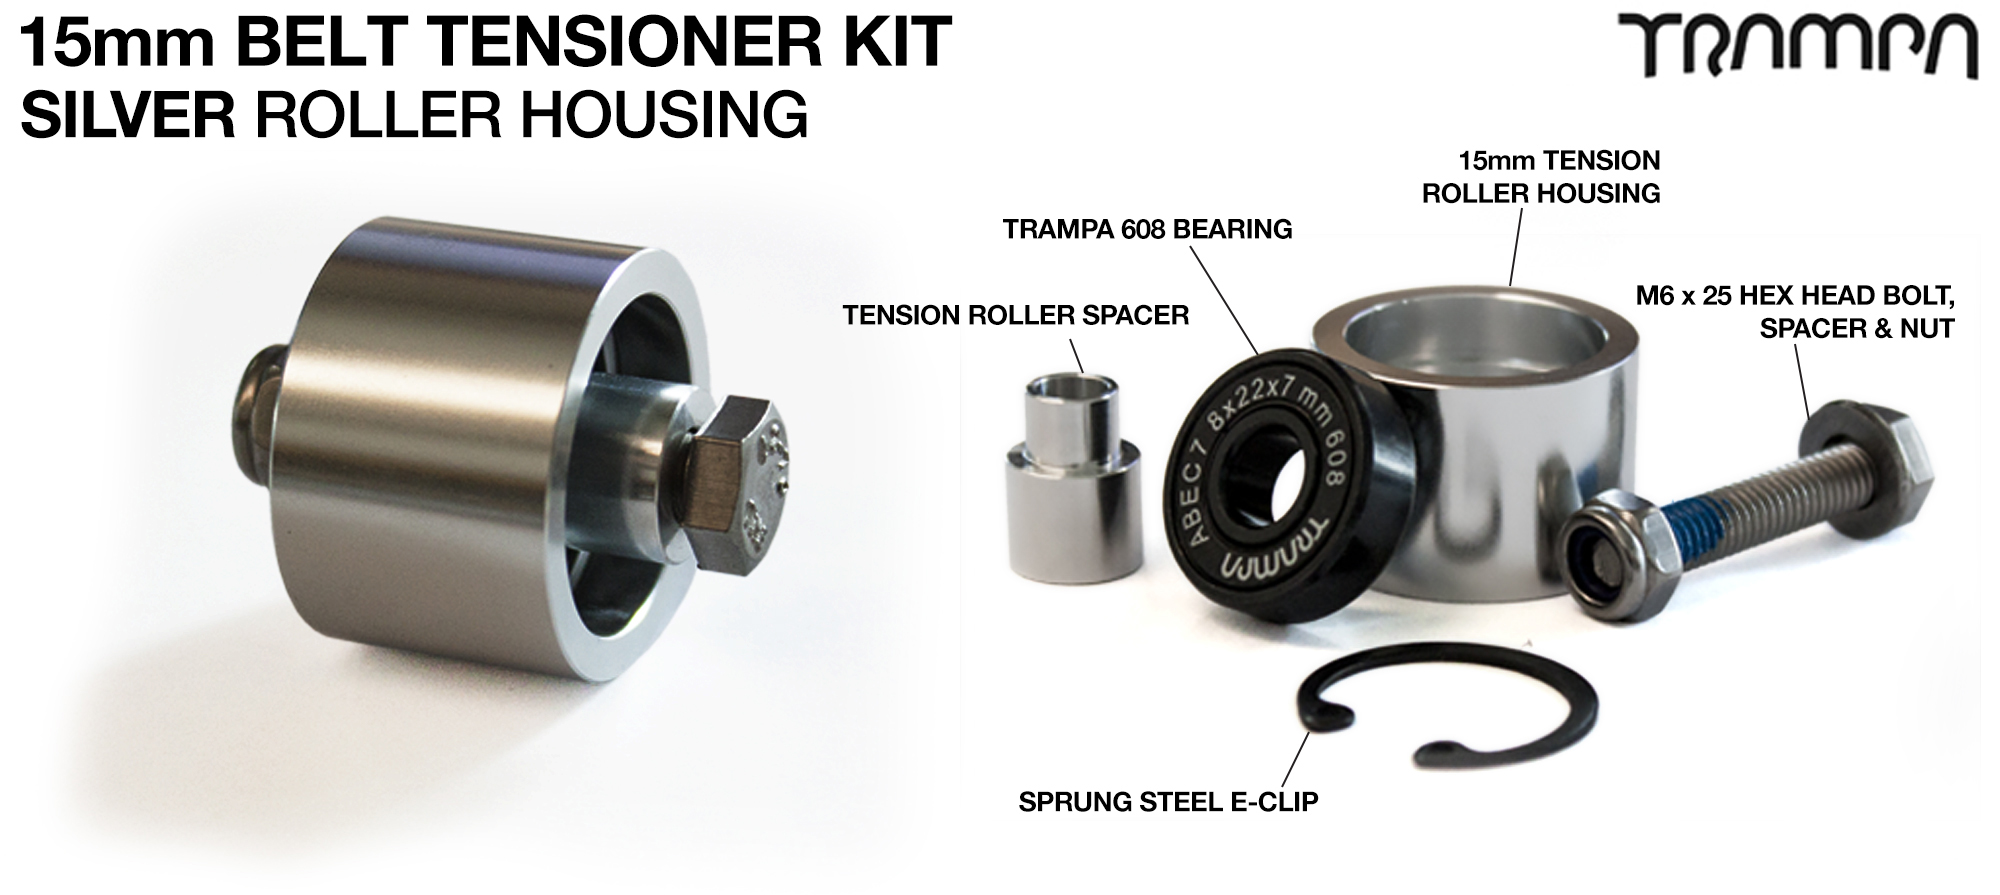 OPEN BELT DRIVE Belt Tensioning System for 15mm Belts - SILVER